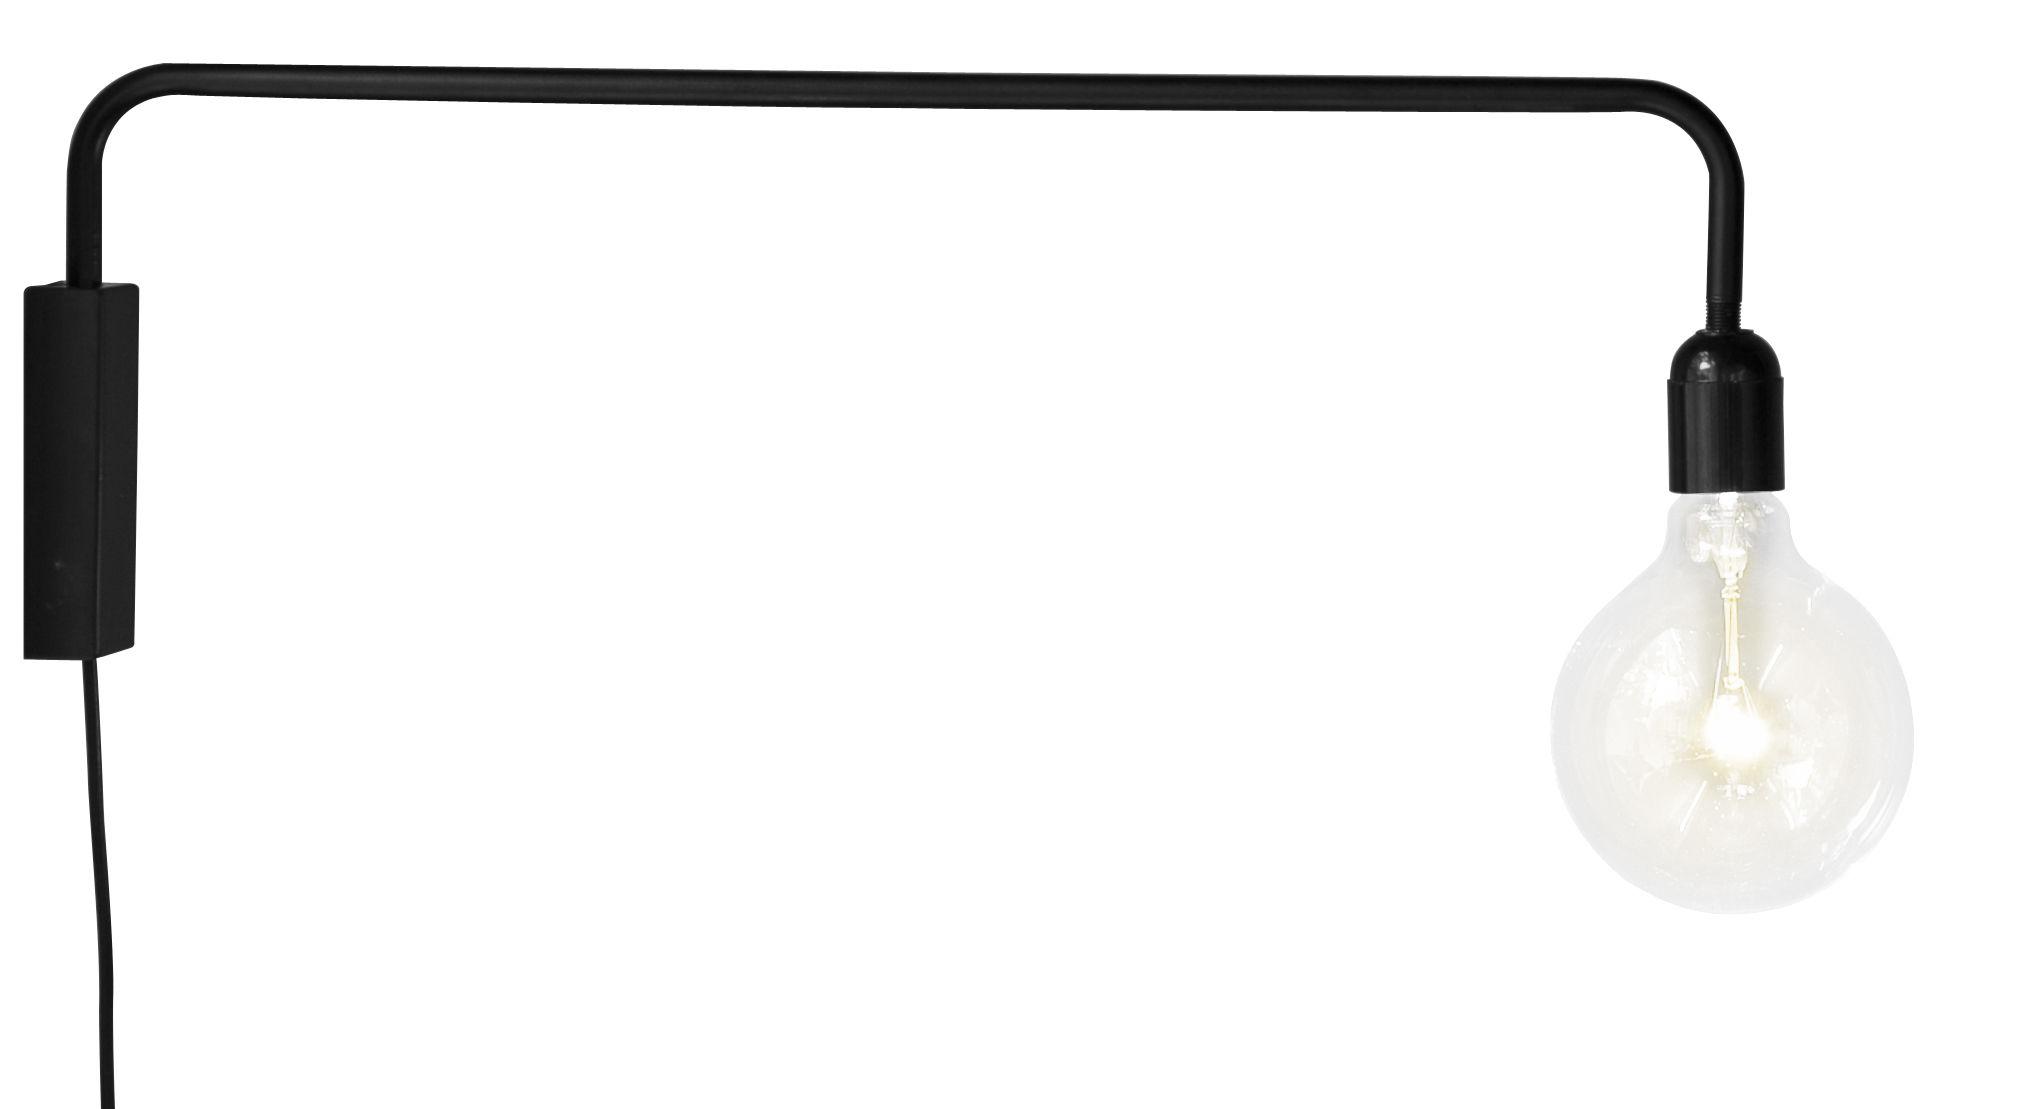 Lighting - Wall Lights - Plok Wall light with plug - / L 60 cm by Sentou Edition - L 60 cm / Black - Matt lacquered metal